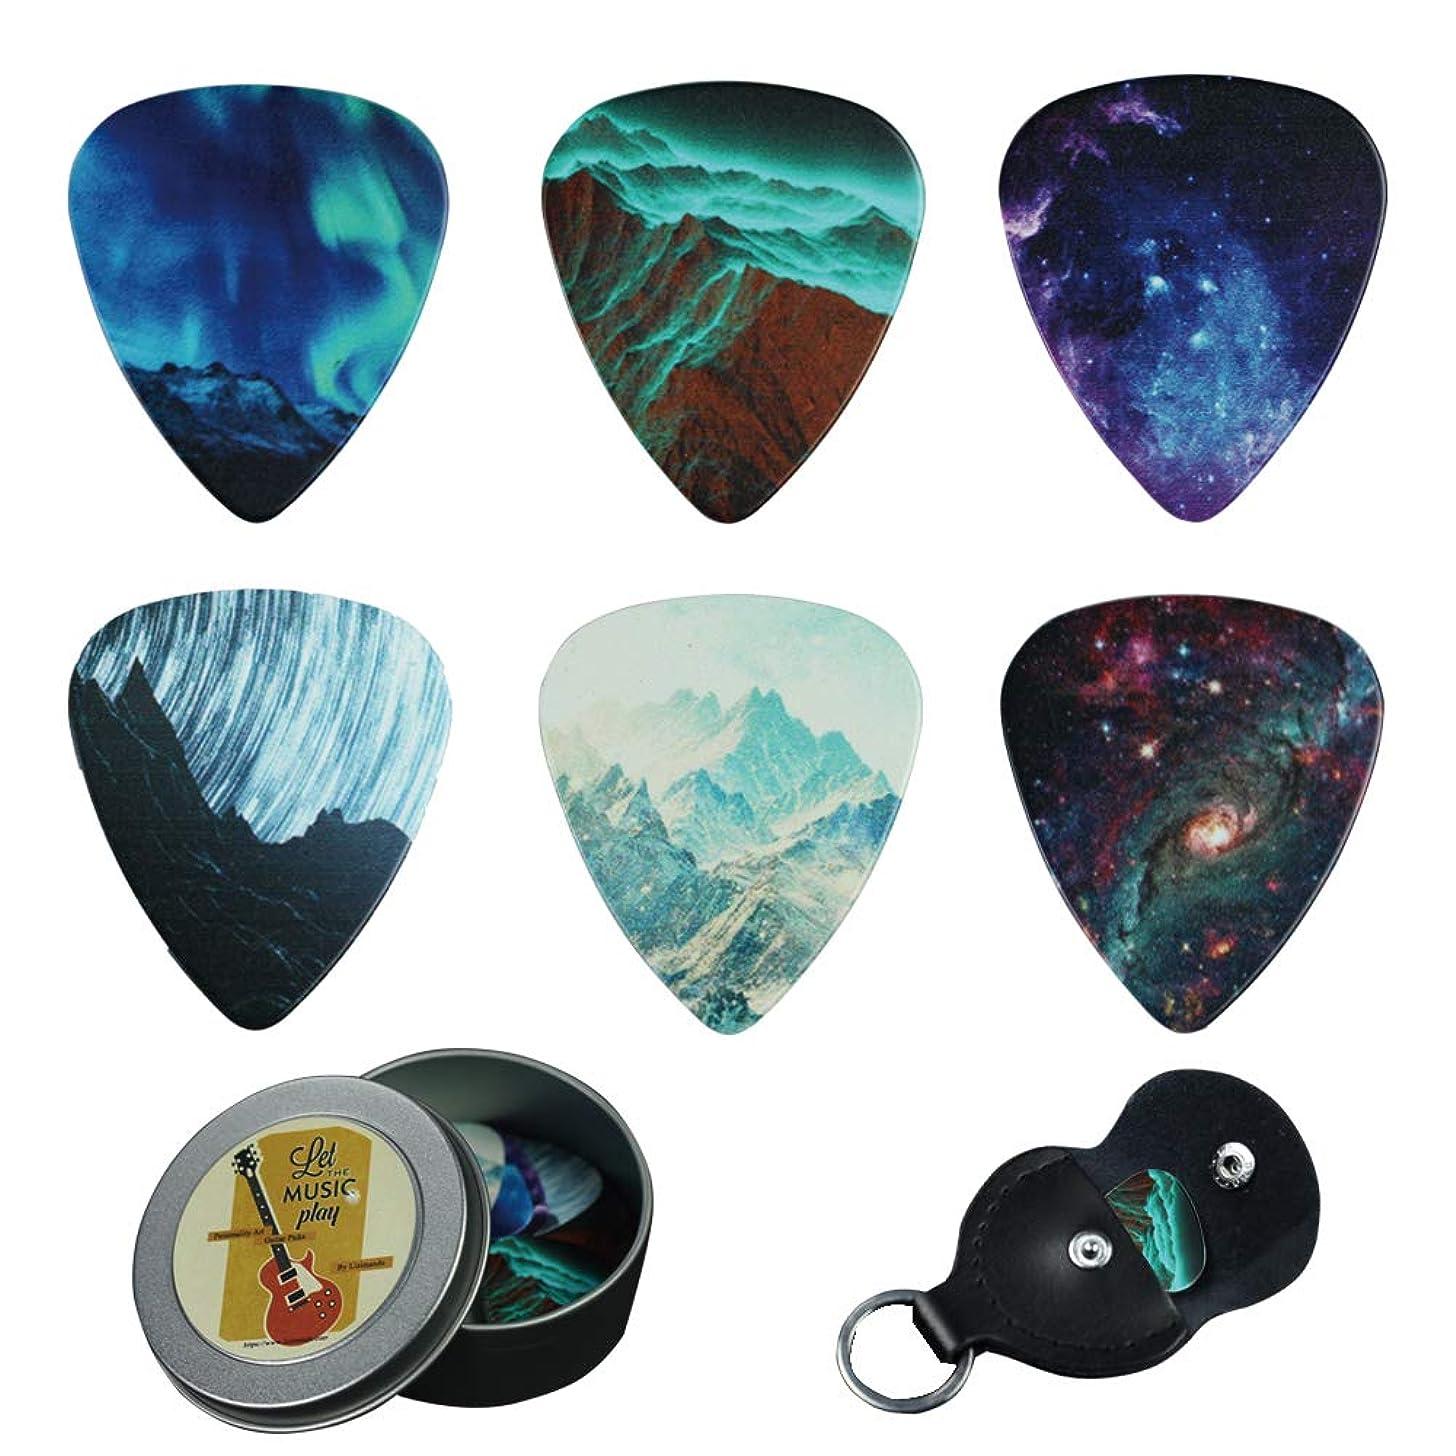 Guitar Picks - Cheliz 12 Medium Gauge Celluloid Guitar Picks In a Box W/Picks Holder. Unique Guitar Gift For Bass, Electric & Acoustic Guitars (Natural Image)